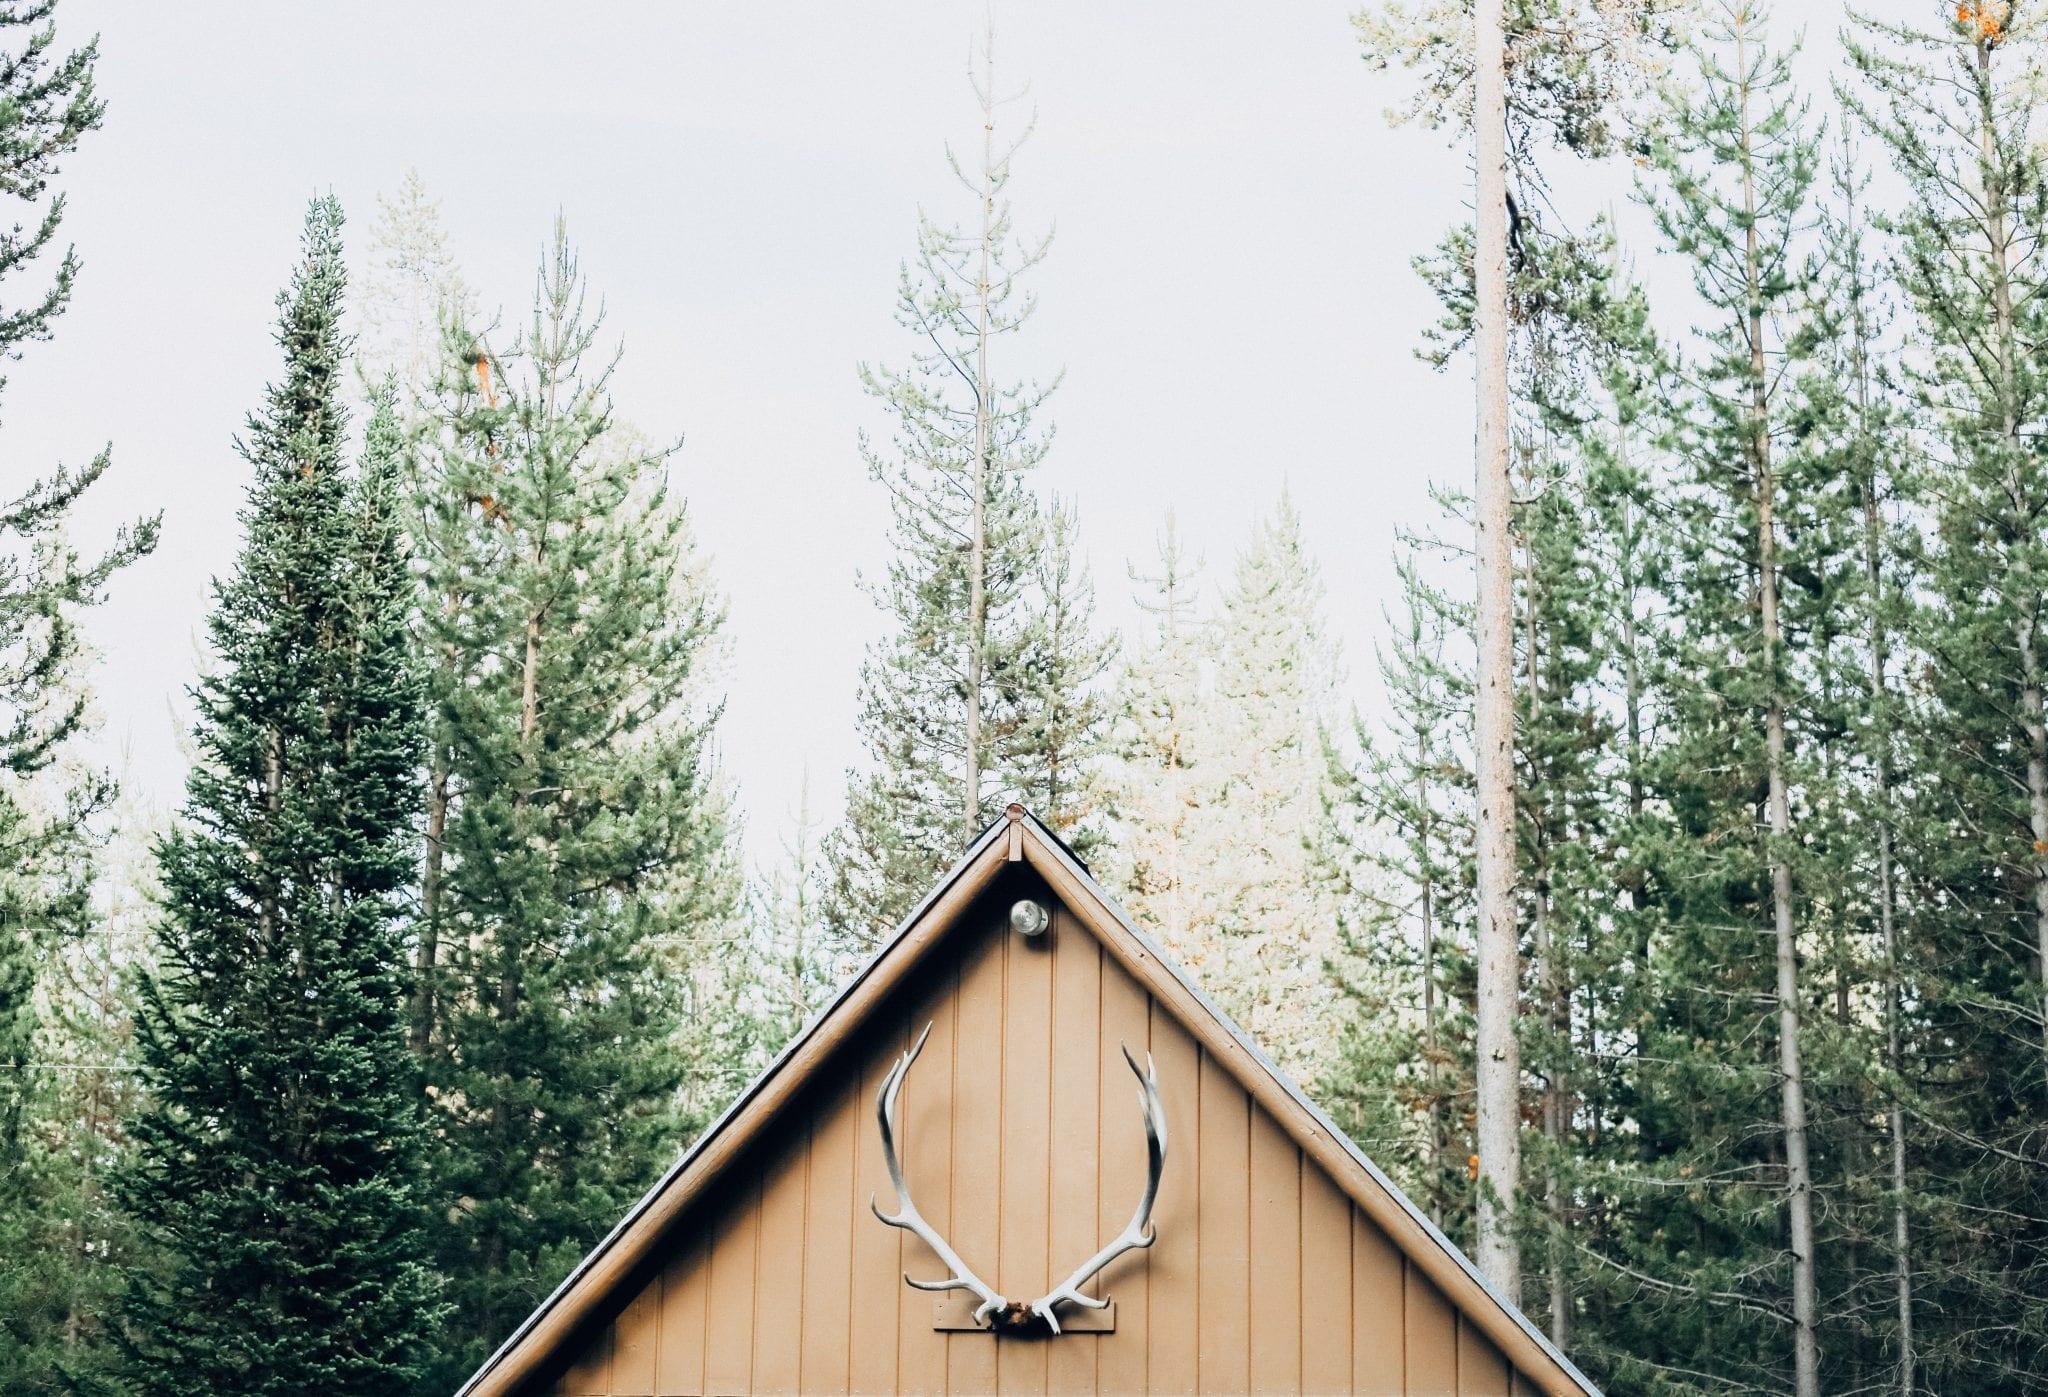 De huttentocht paklijst; wat heb je nodig? | The Hike